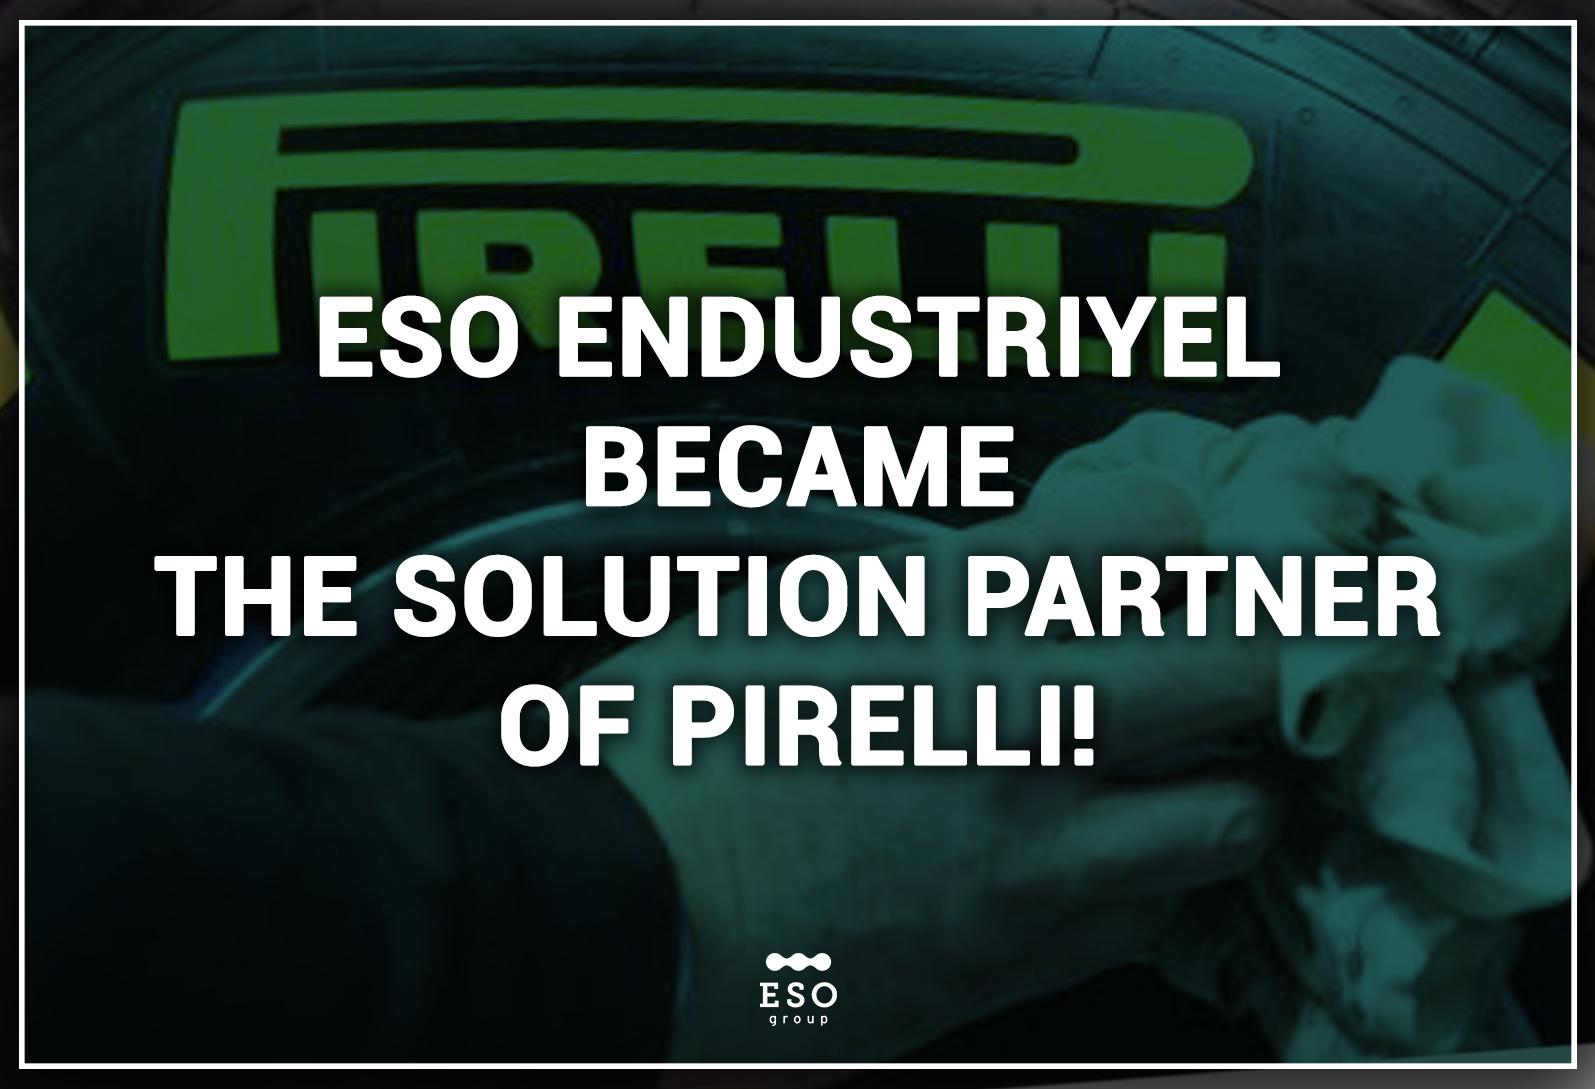 ESO Endüstriyel Otomasyon Became The Solution Partner of Pirelli